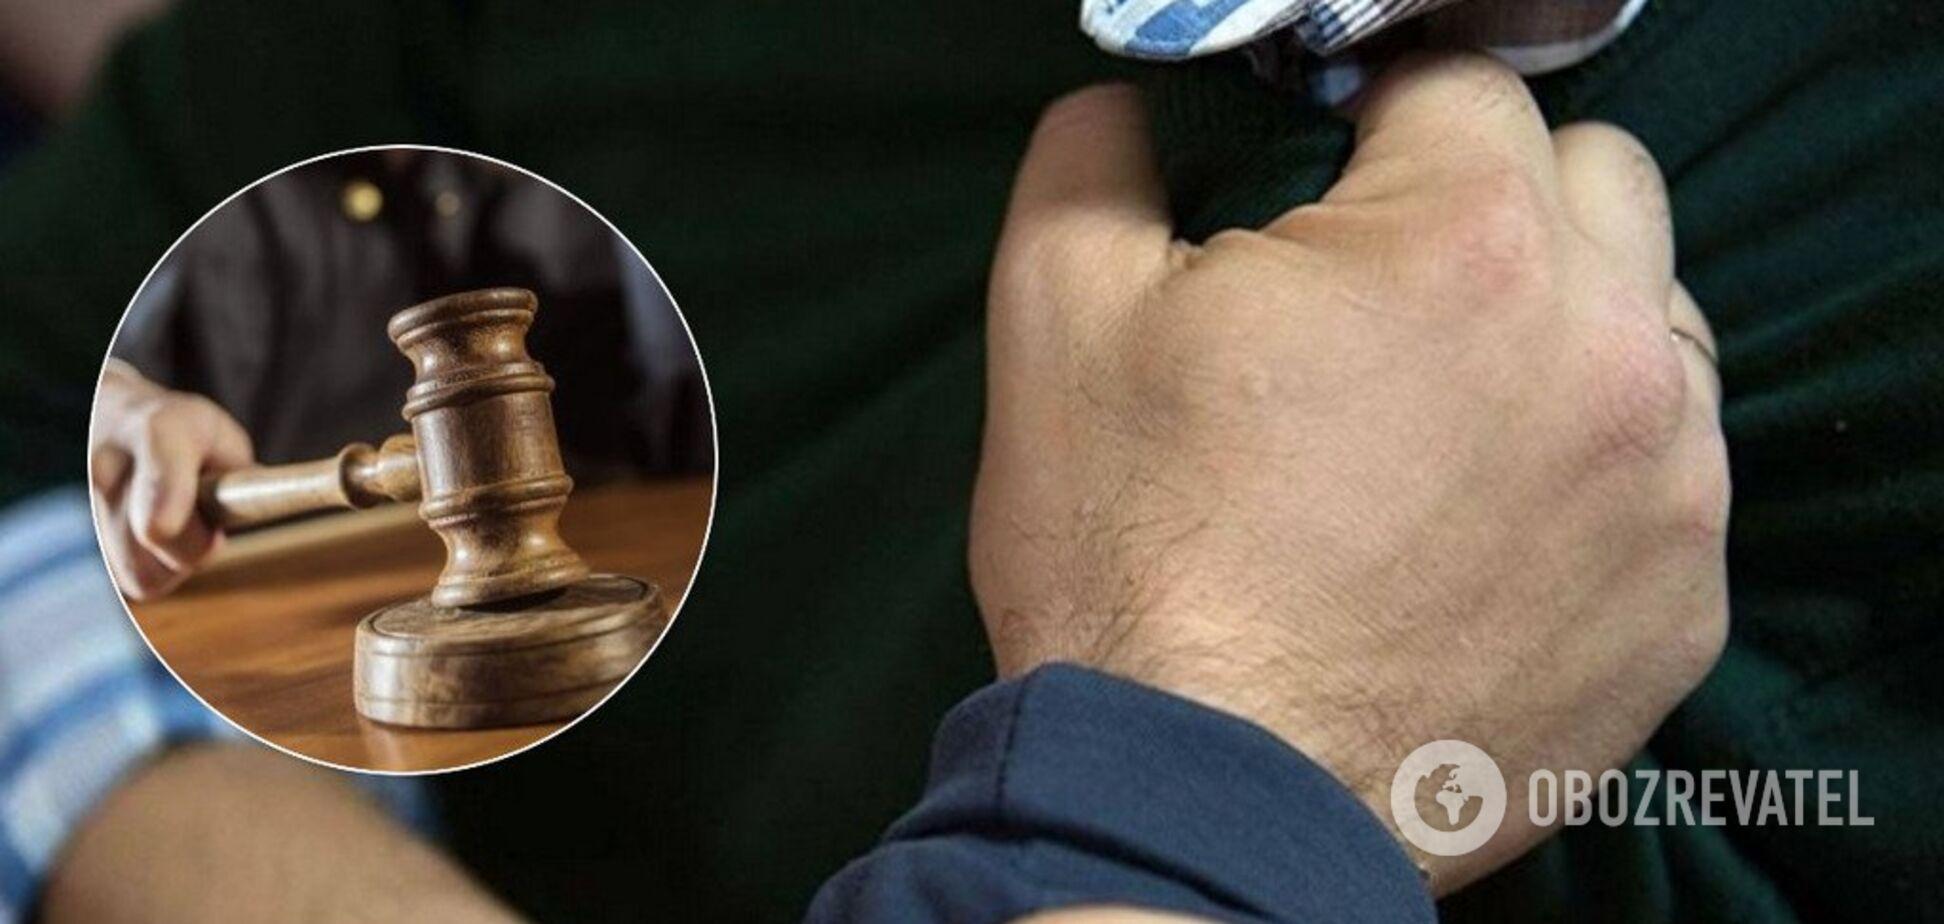 Нападение на журналиста в Кривом Роге: суд принял решение